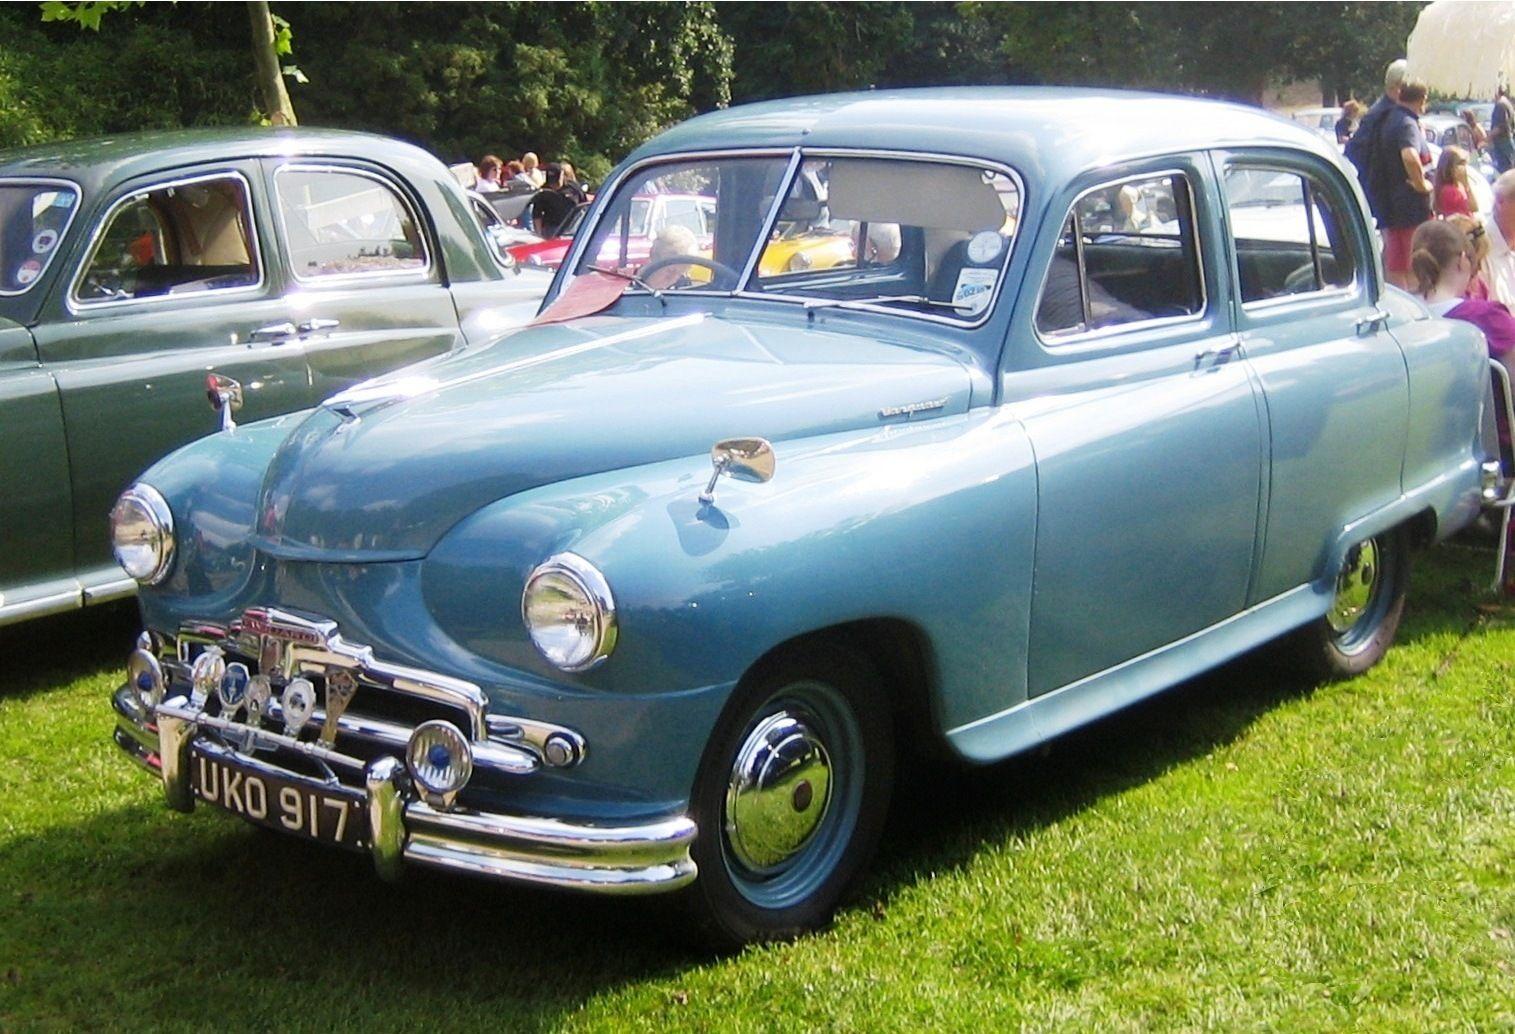 1950s Standard Vanguard Mk2 Maintenance Of Old Vehicles